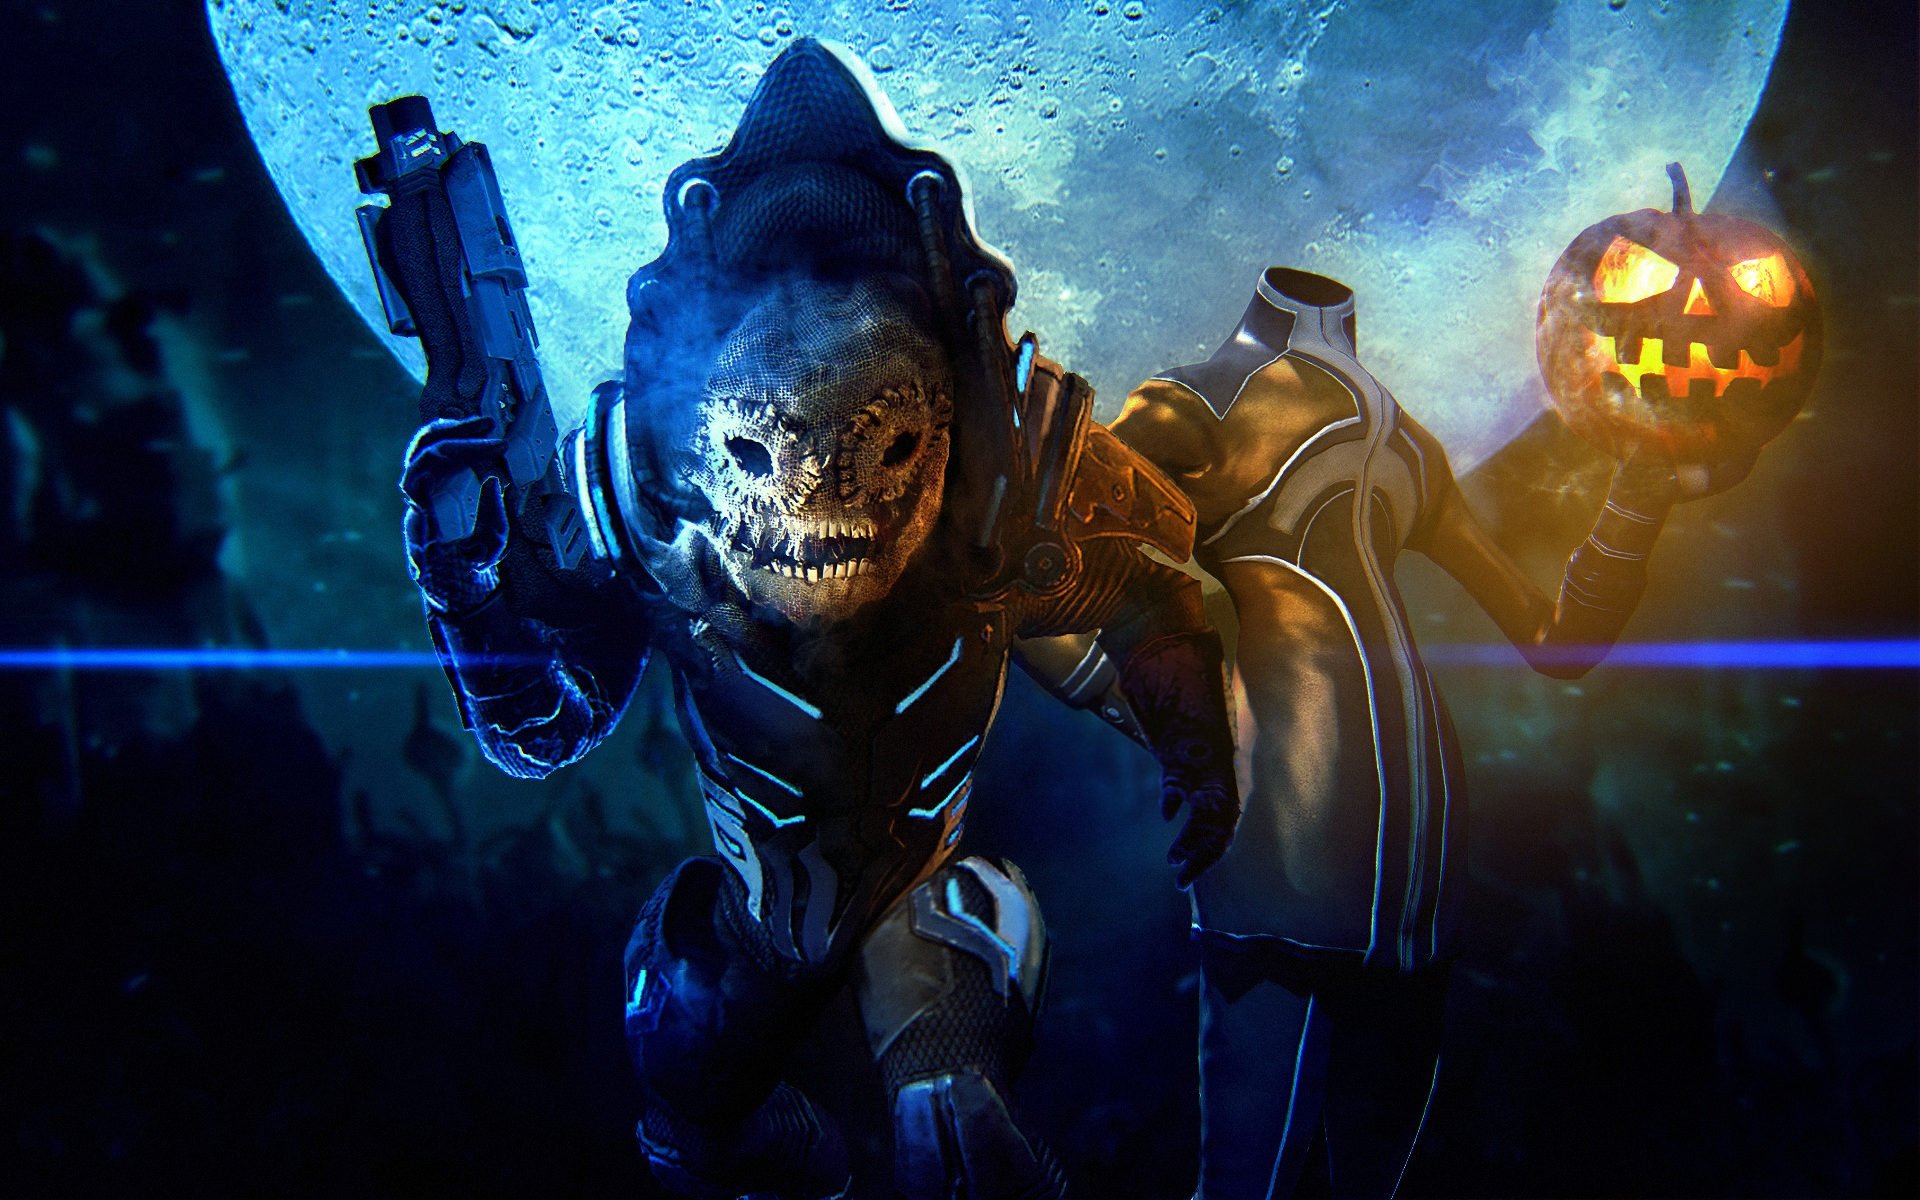 Mass Effect 3 Multiplayer Halloween Challenge BioWare Blog 1920x1200